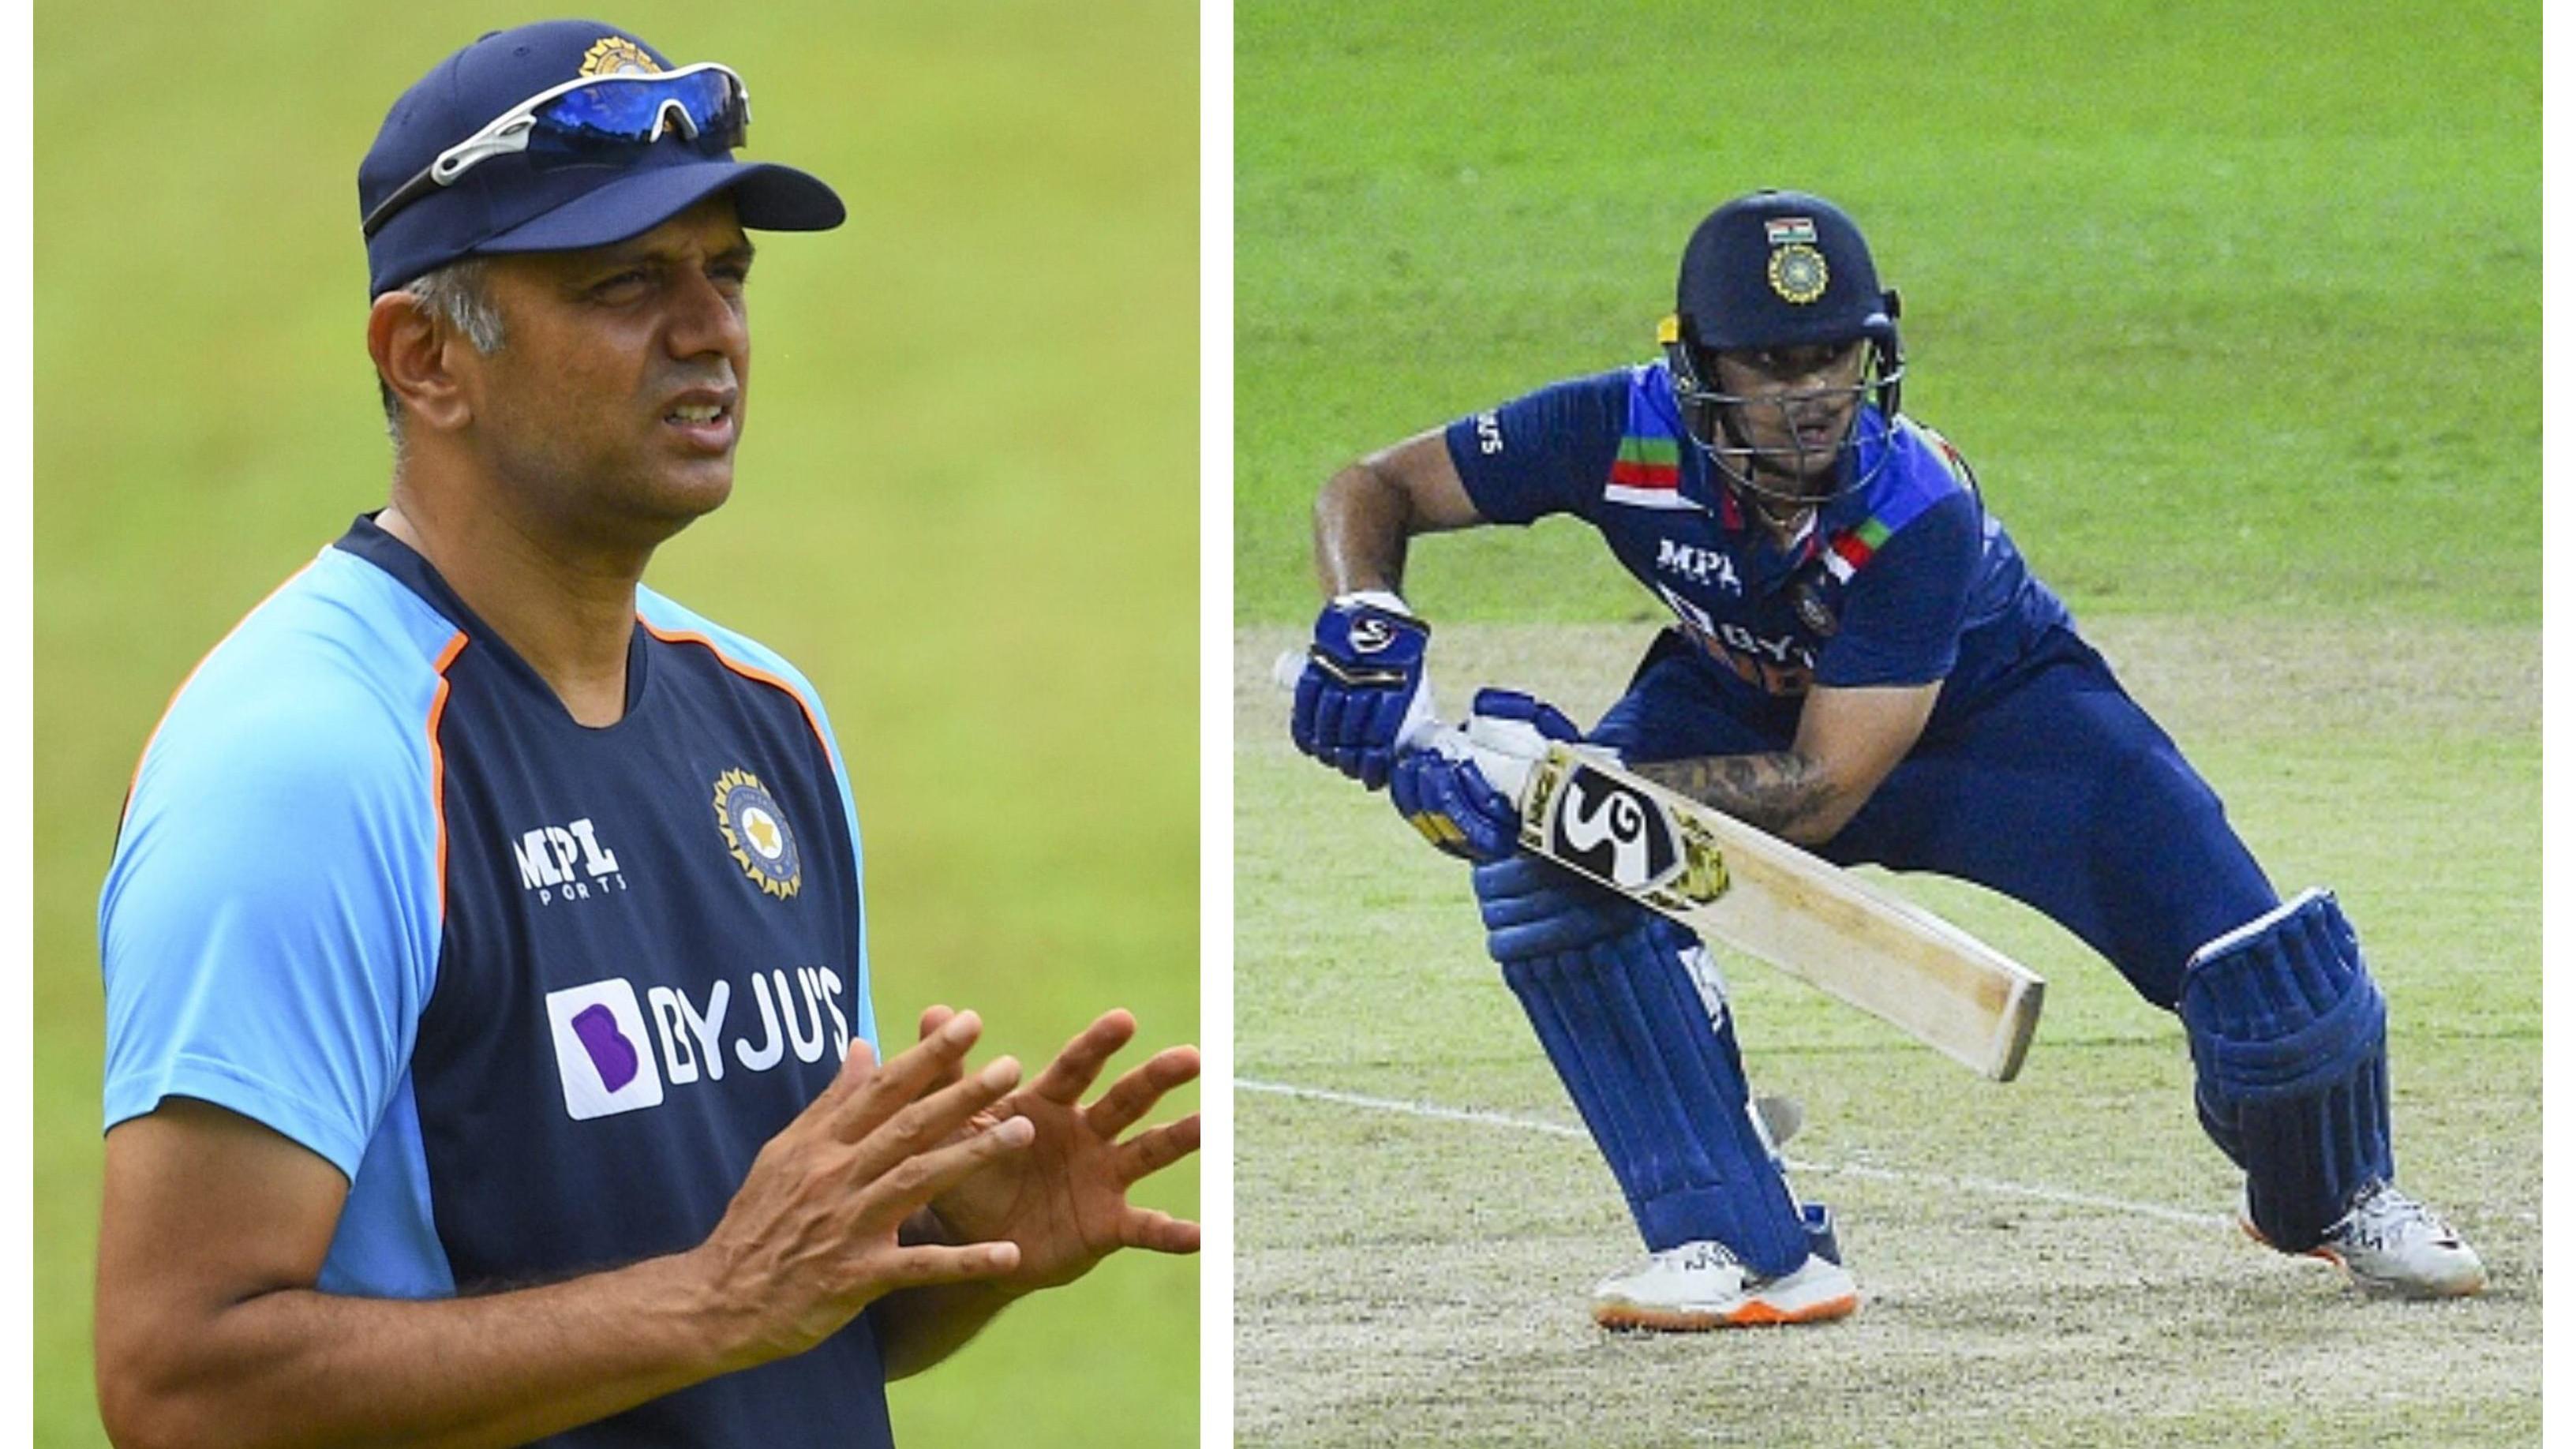 SL v IND 2021: 'Dravid Sir had told me during the practice sessions that I will bat at No.3', says Ishan Kishan